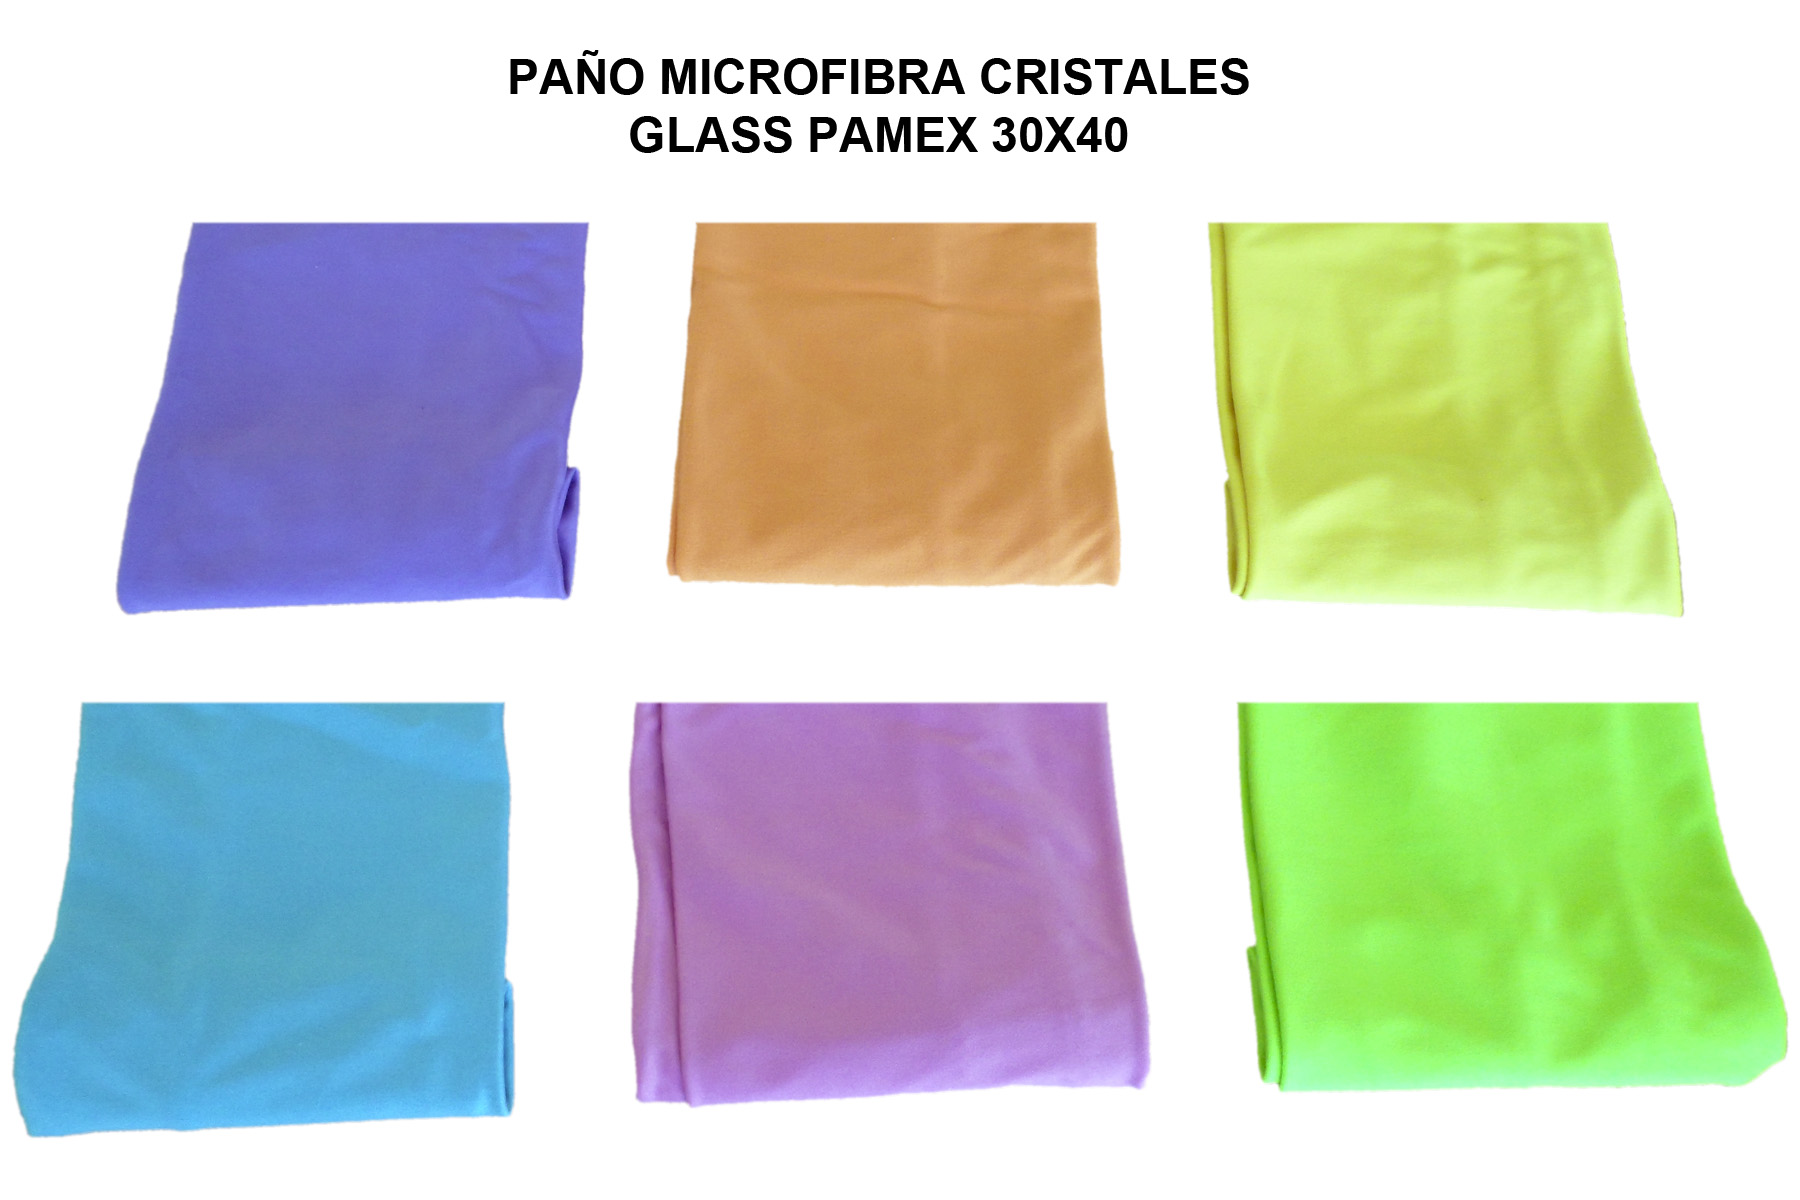 PAÑO MICROFIBRA CRISTALES GLASS PAMEX